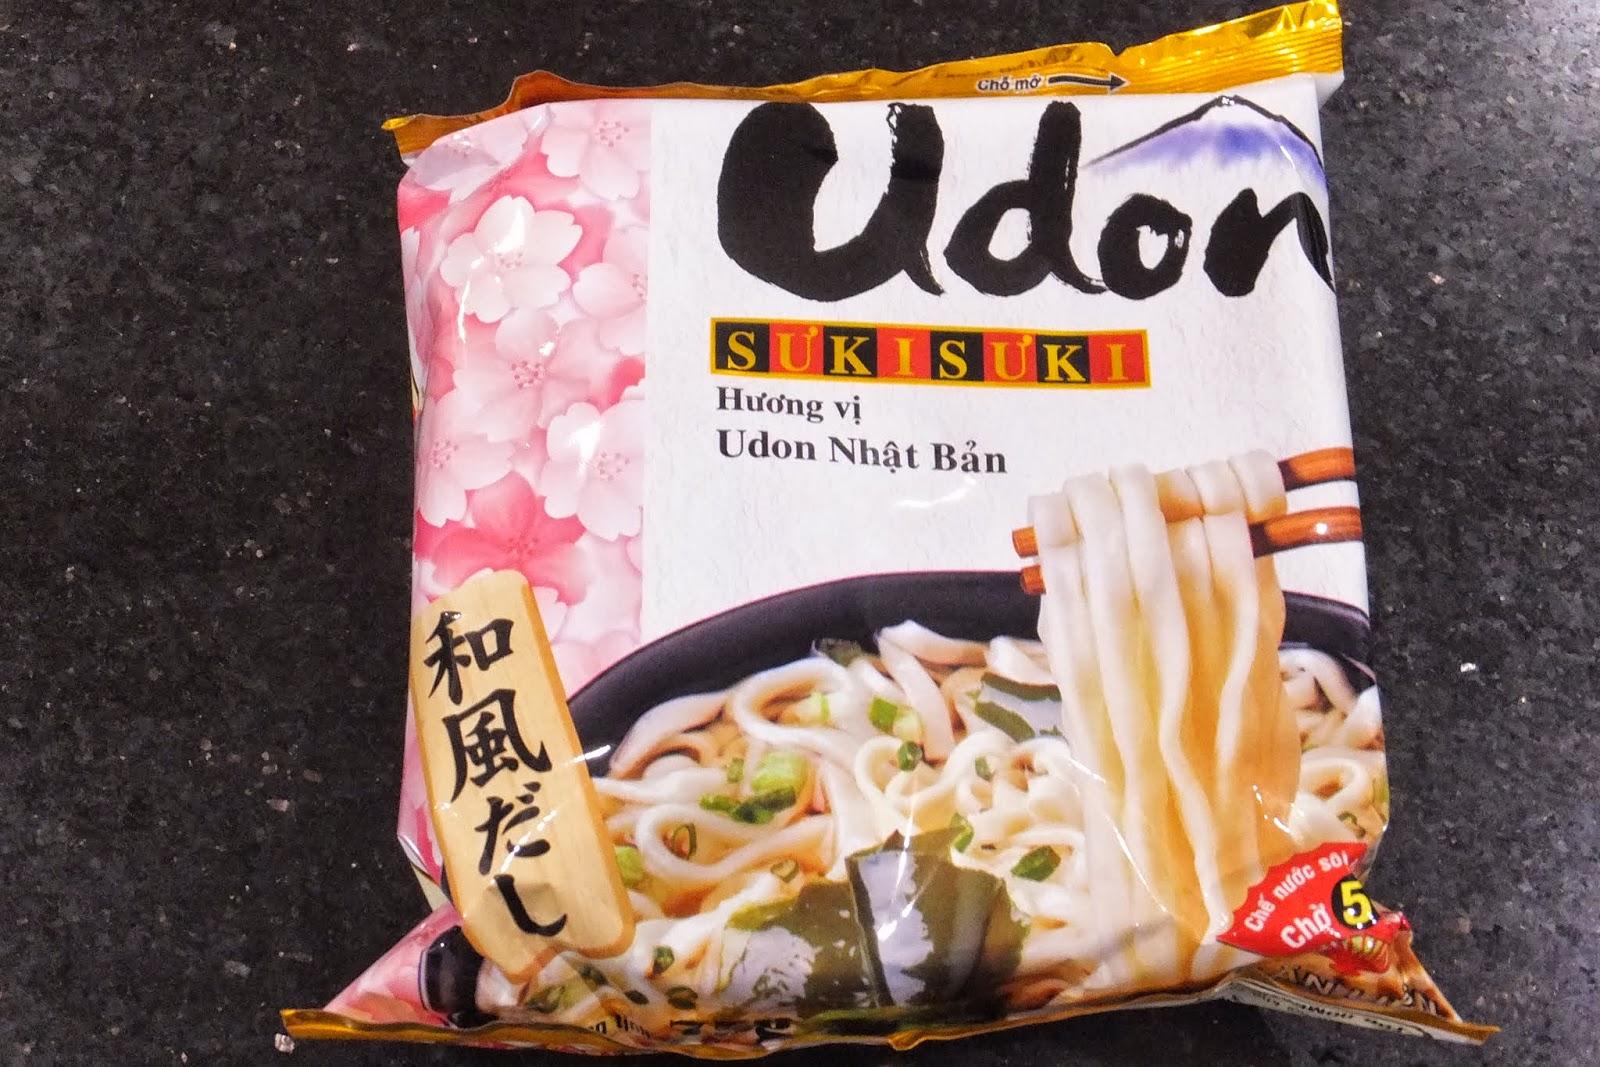 udonsukisuki-vinaacecook ビナエースコックのウドンスキスキ